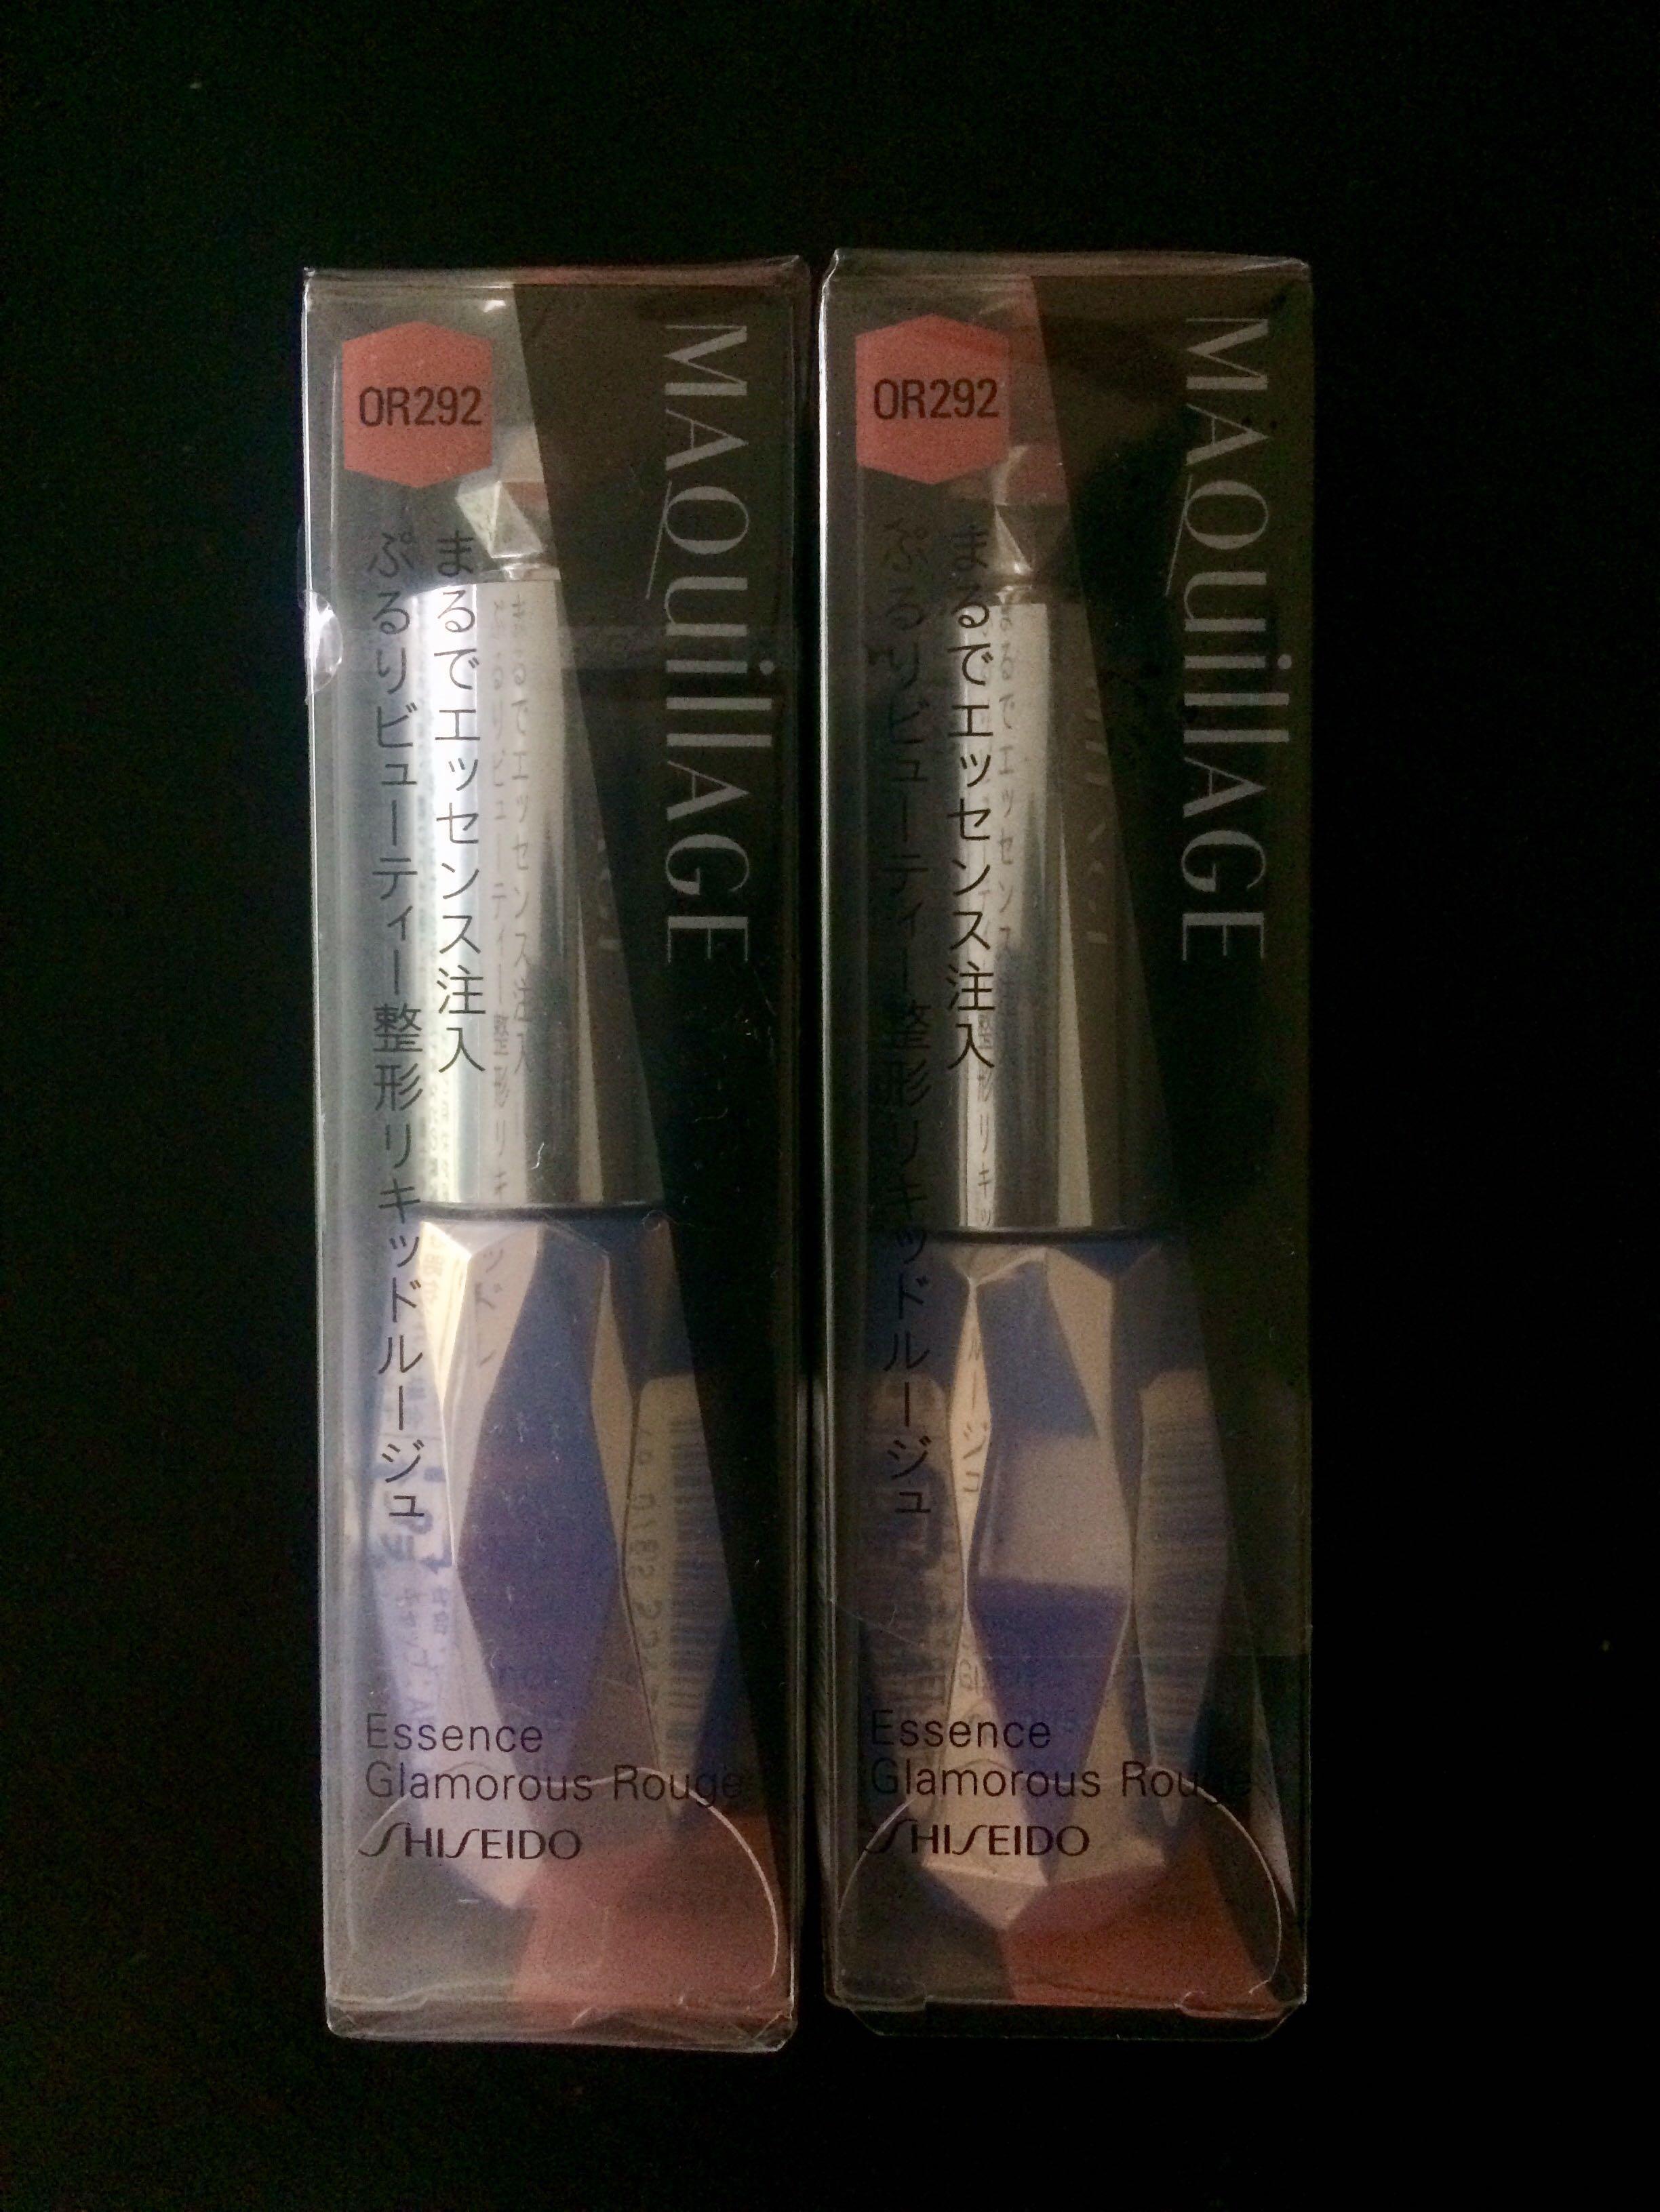 Shiseido maquillage glamorous essence rogue lip colour & balm